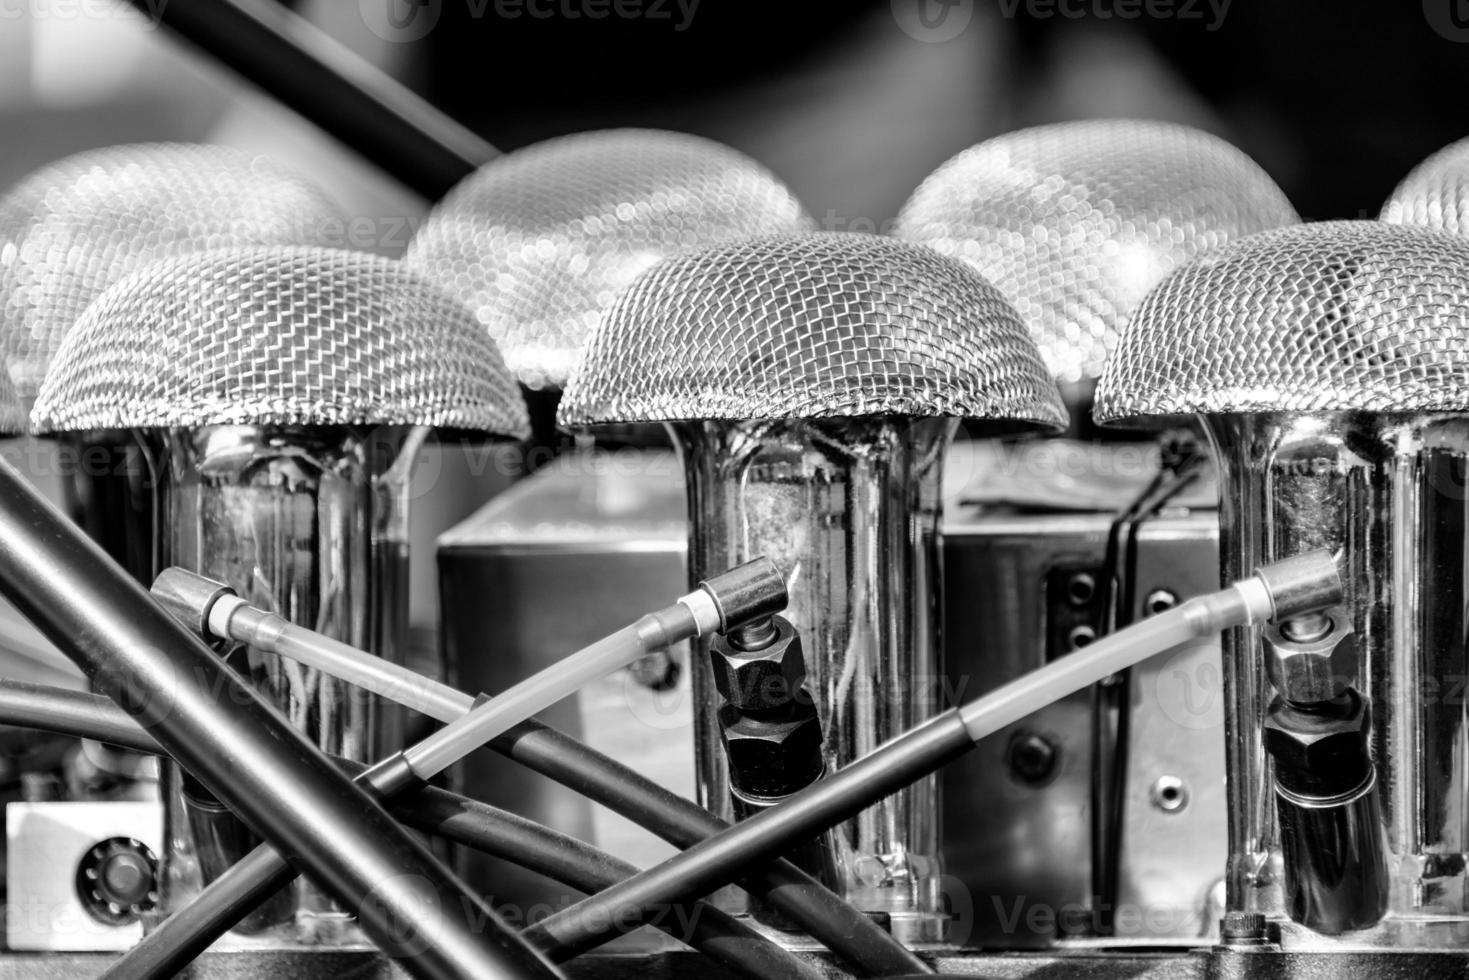 detalhe de um motor vintage foto